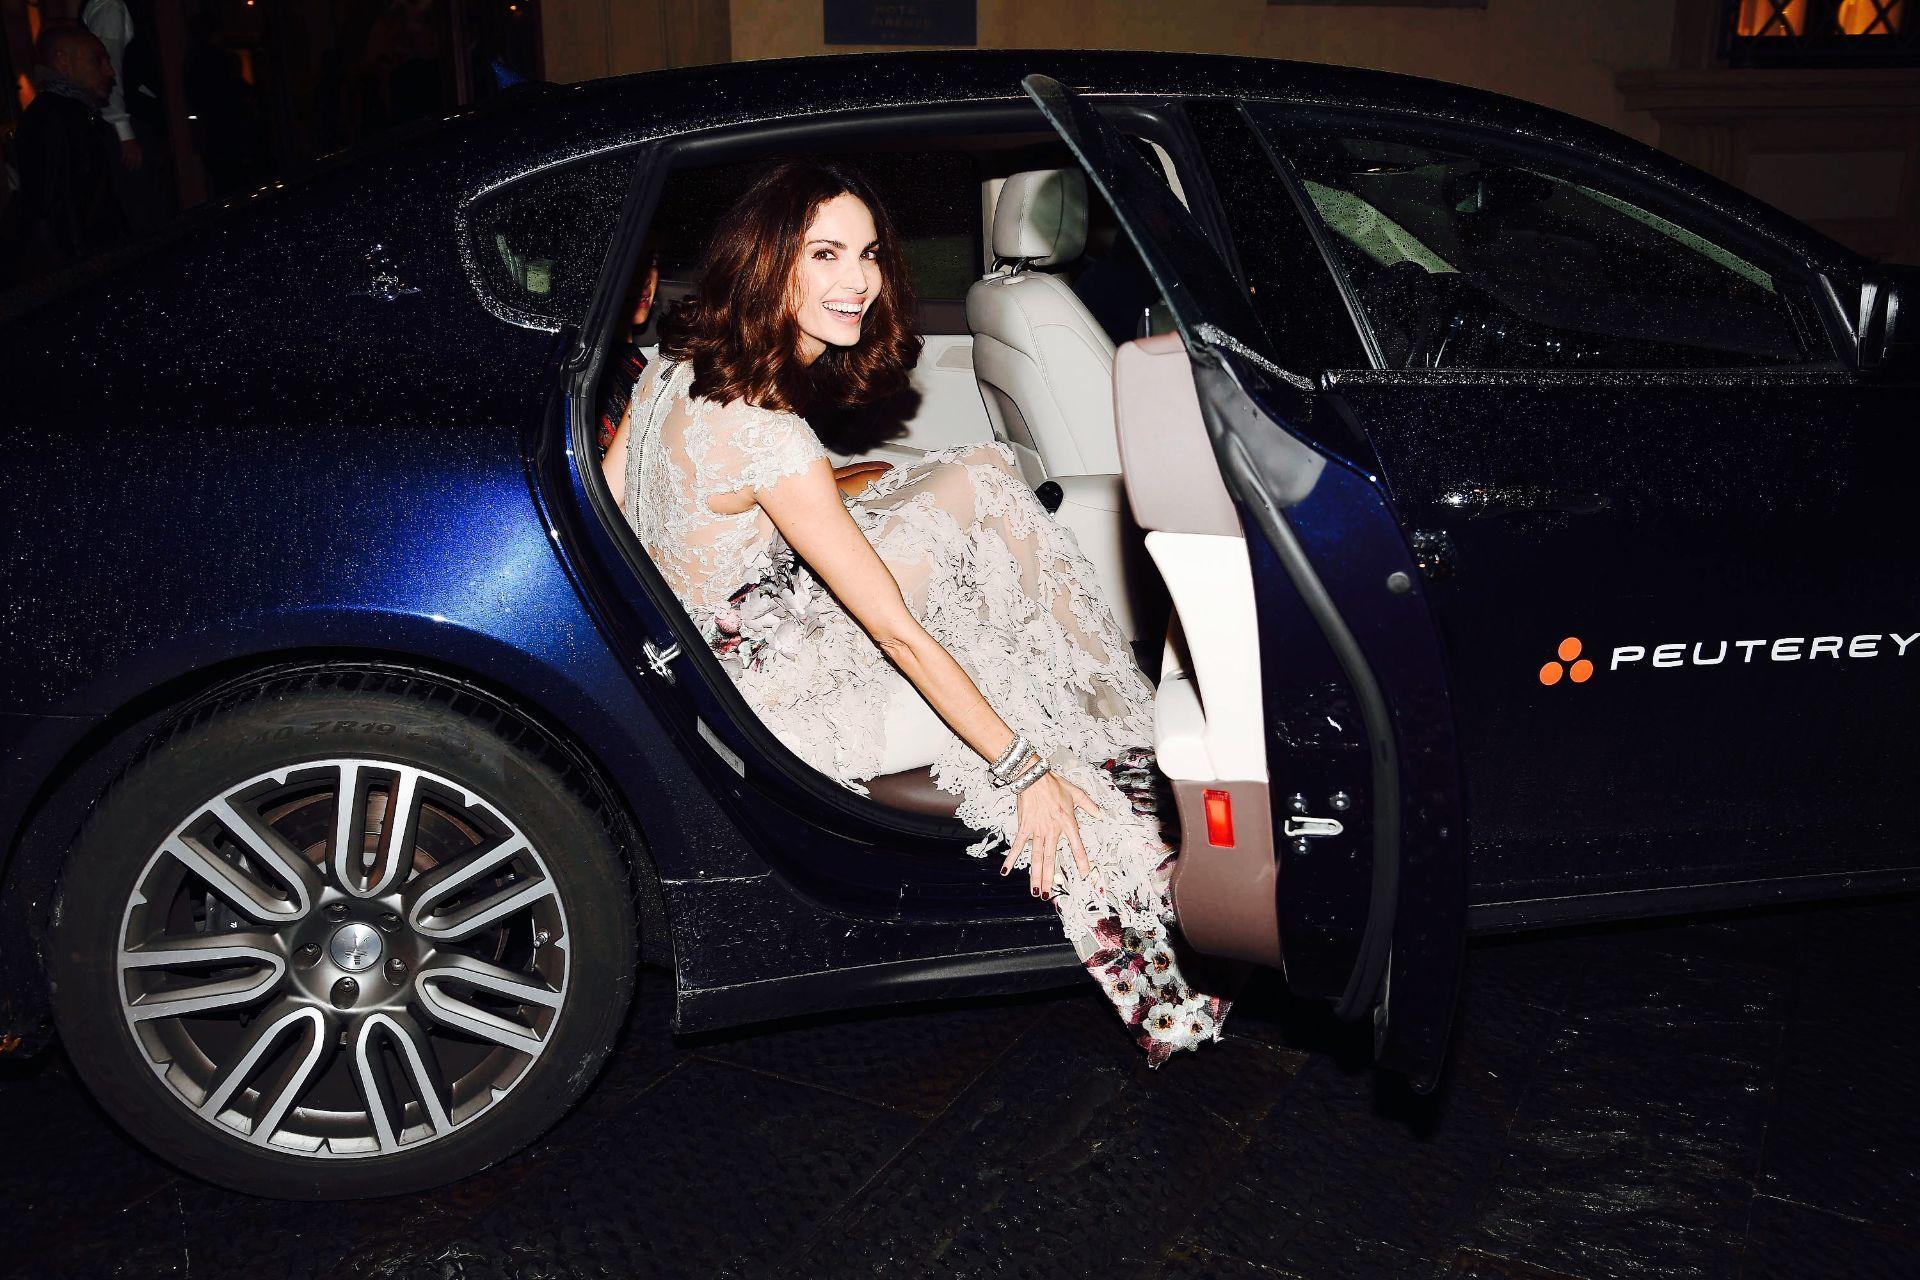 Chiara Ferragni, Eugenia Silva, Nataly y Murad Osmann acuden al estreno mundial de la película a bordo de Maserati Quattroporte.